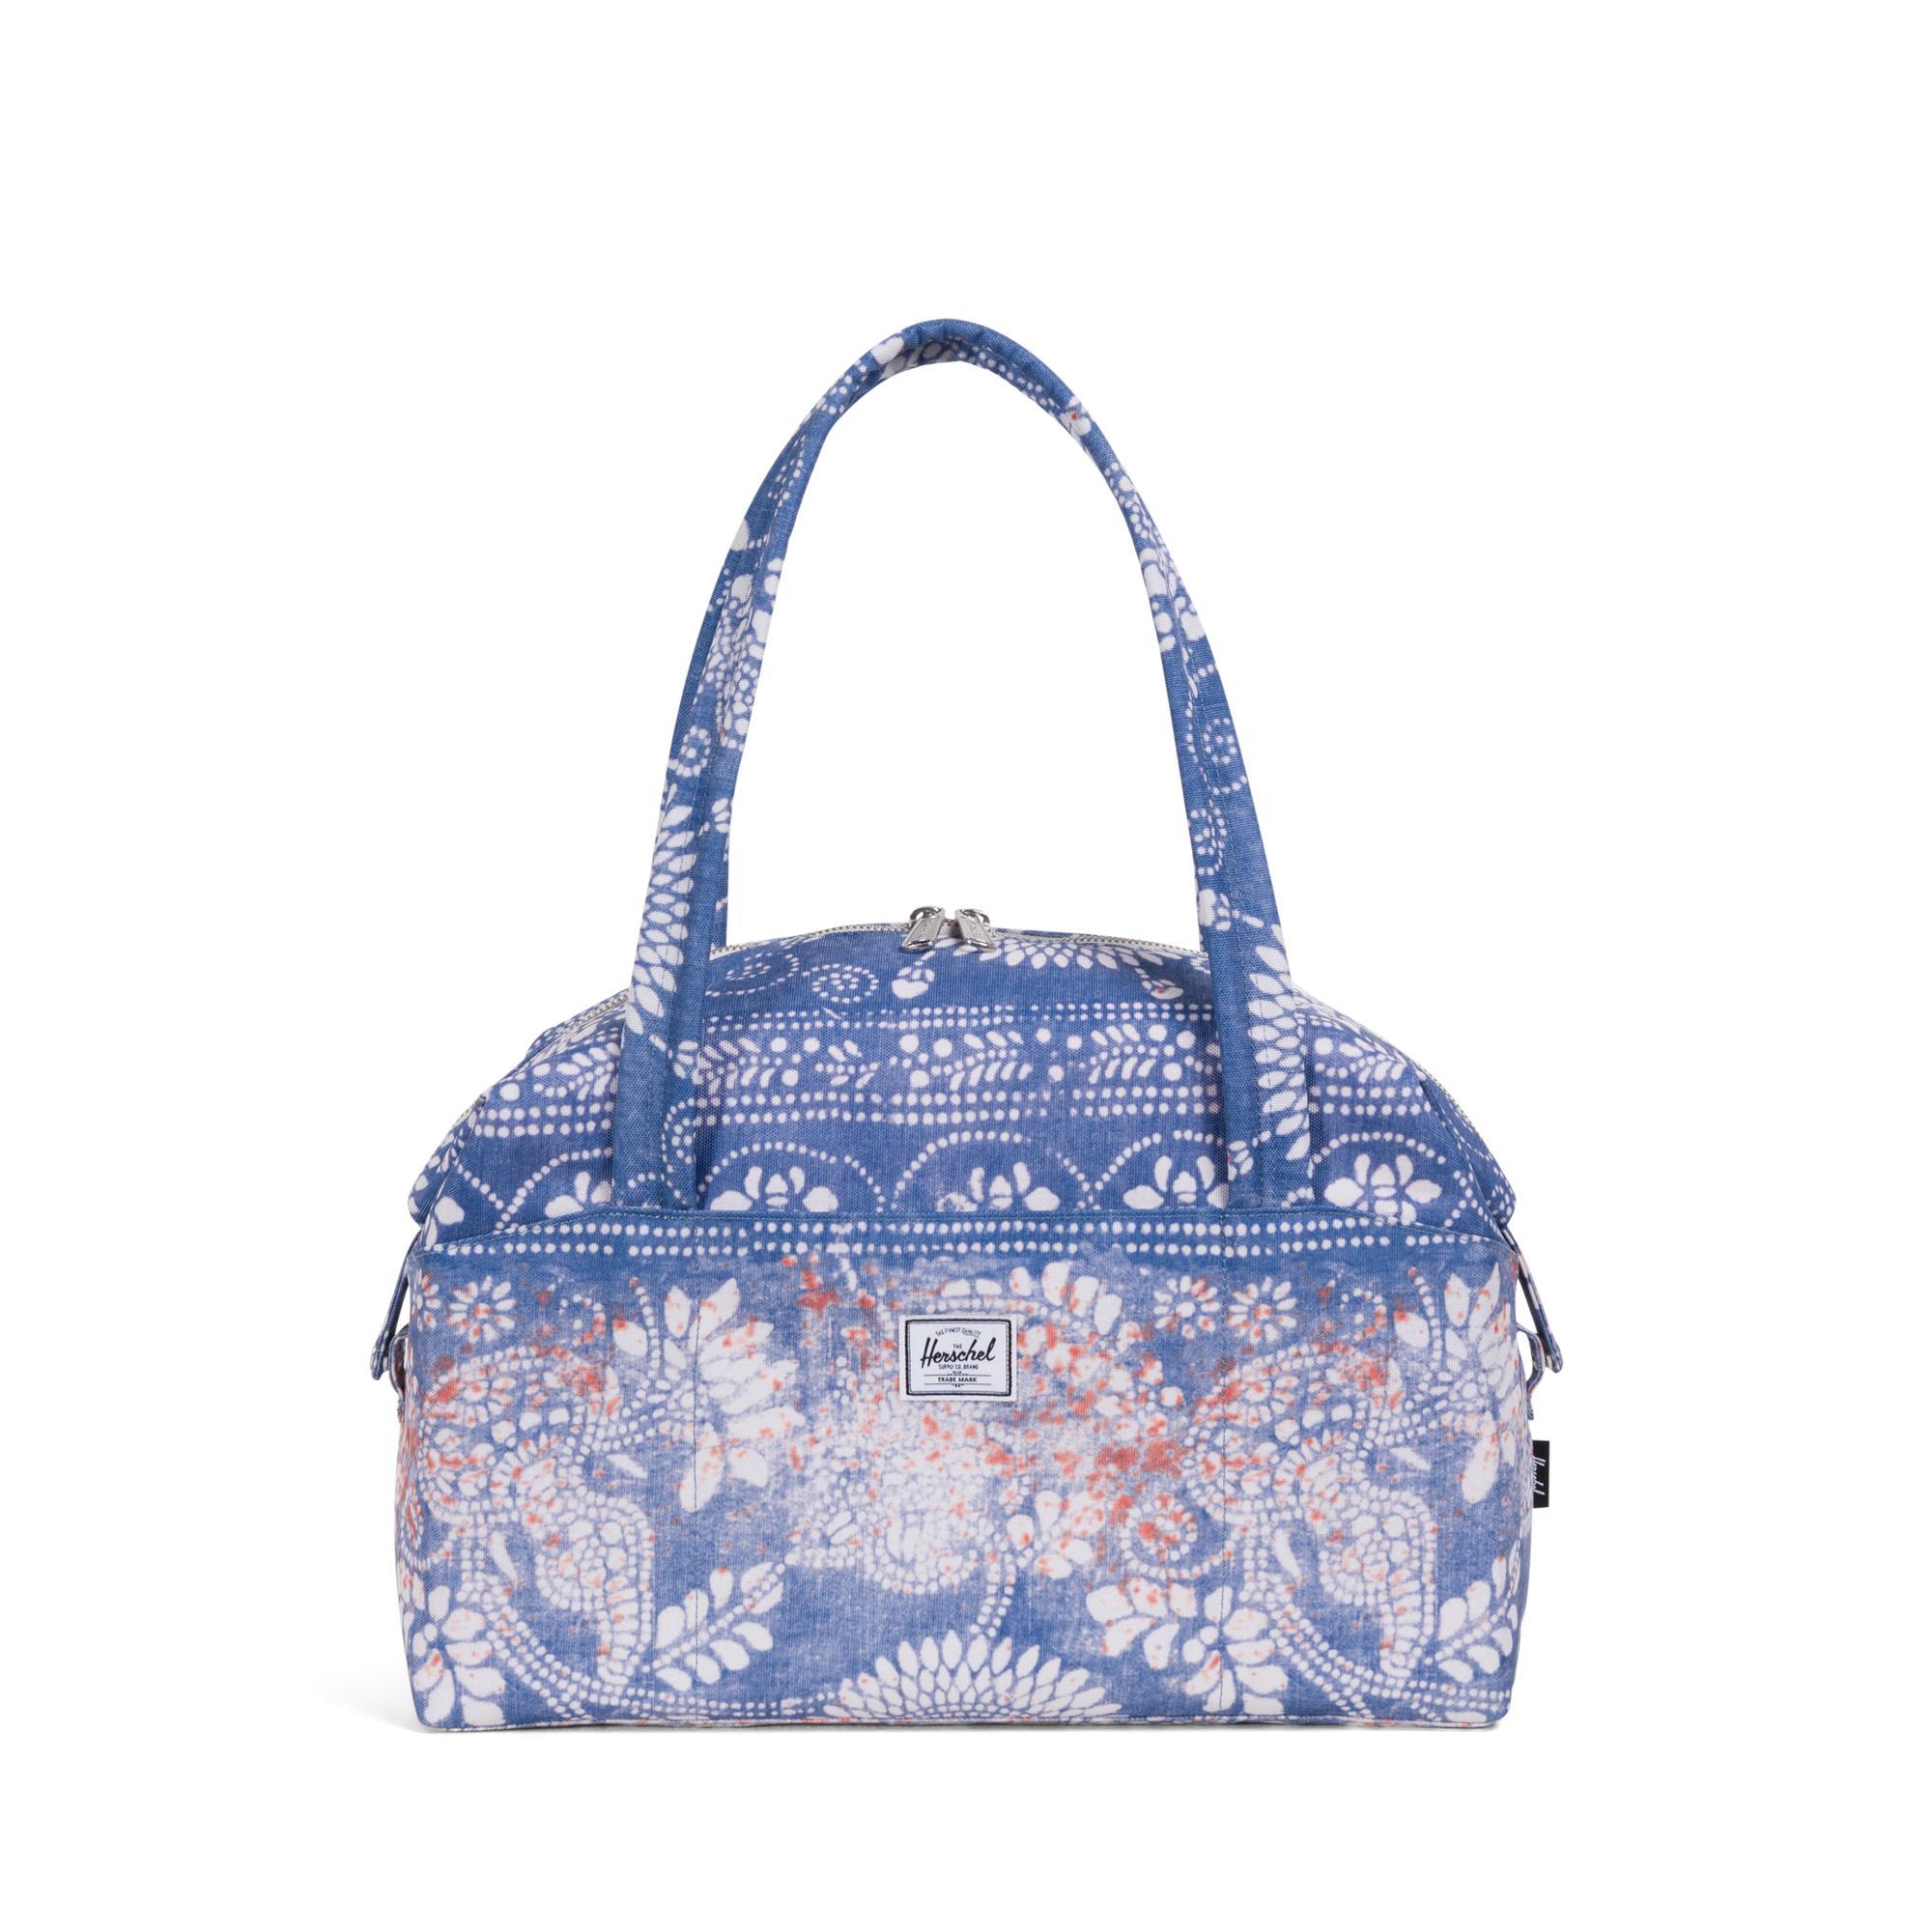 4f607e329c37 Details about Herschel Strand X Small 12.5 Litre Duffle Carry Bag Chai